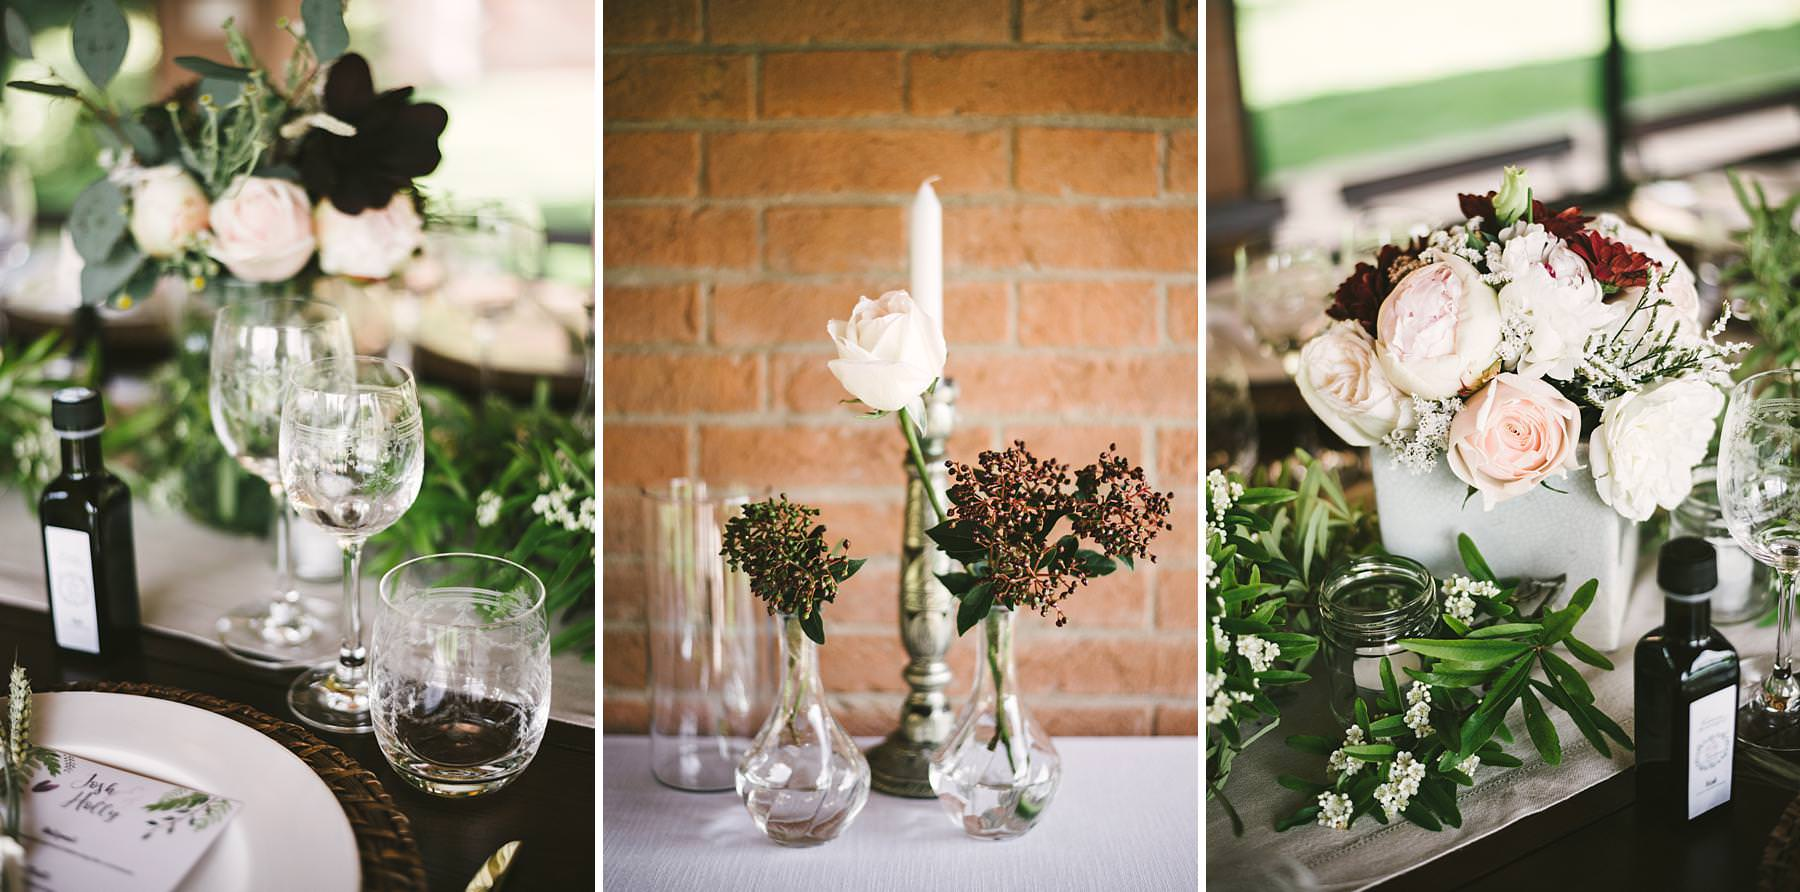 Elegant intimate and beautiful wedding dinner decor at historic venue of Villa l'Antica Posta